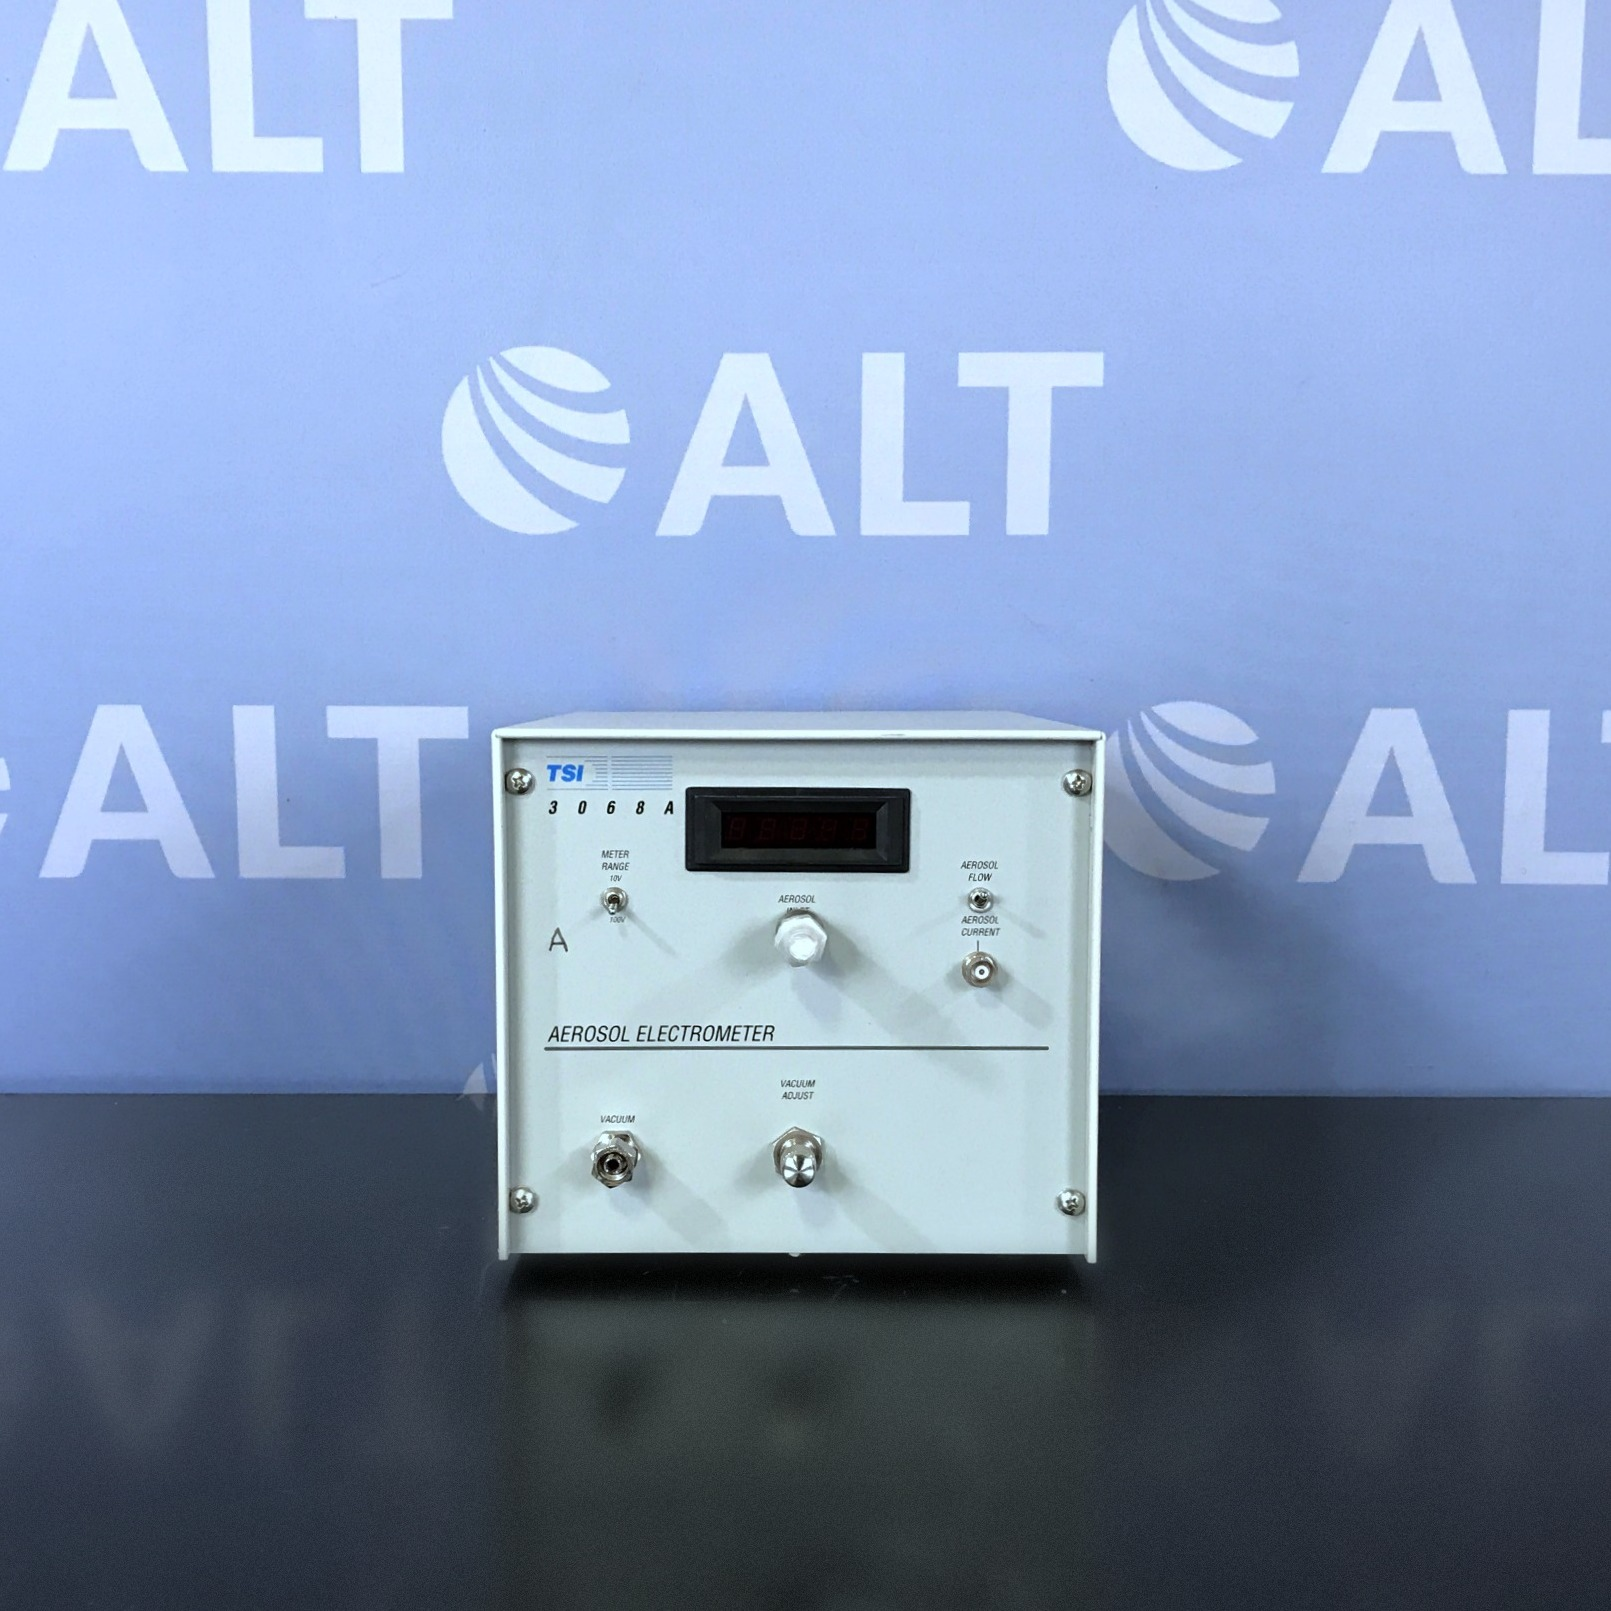 Model 3068A Aerosol Electrometer Name